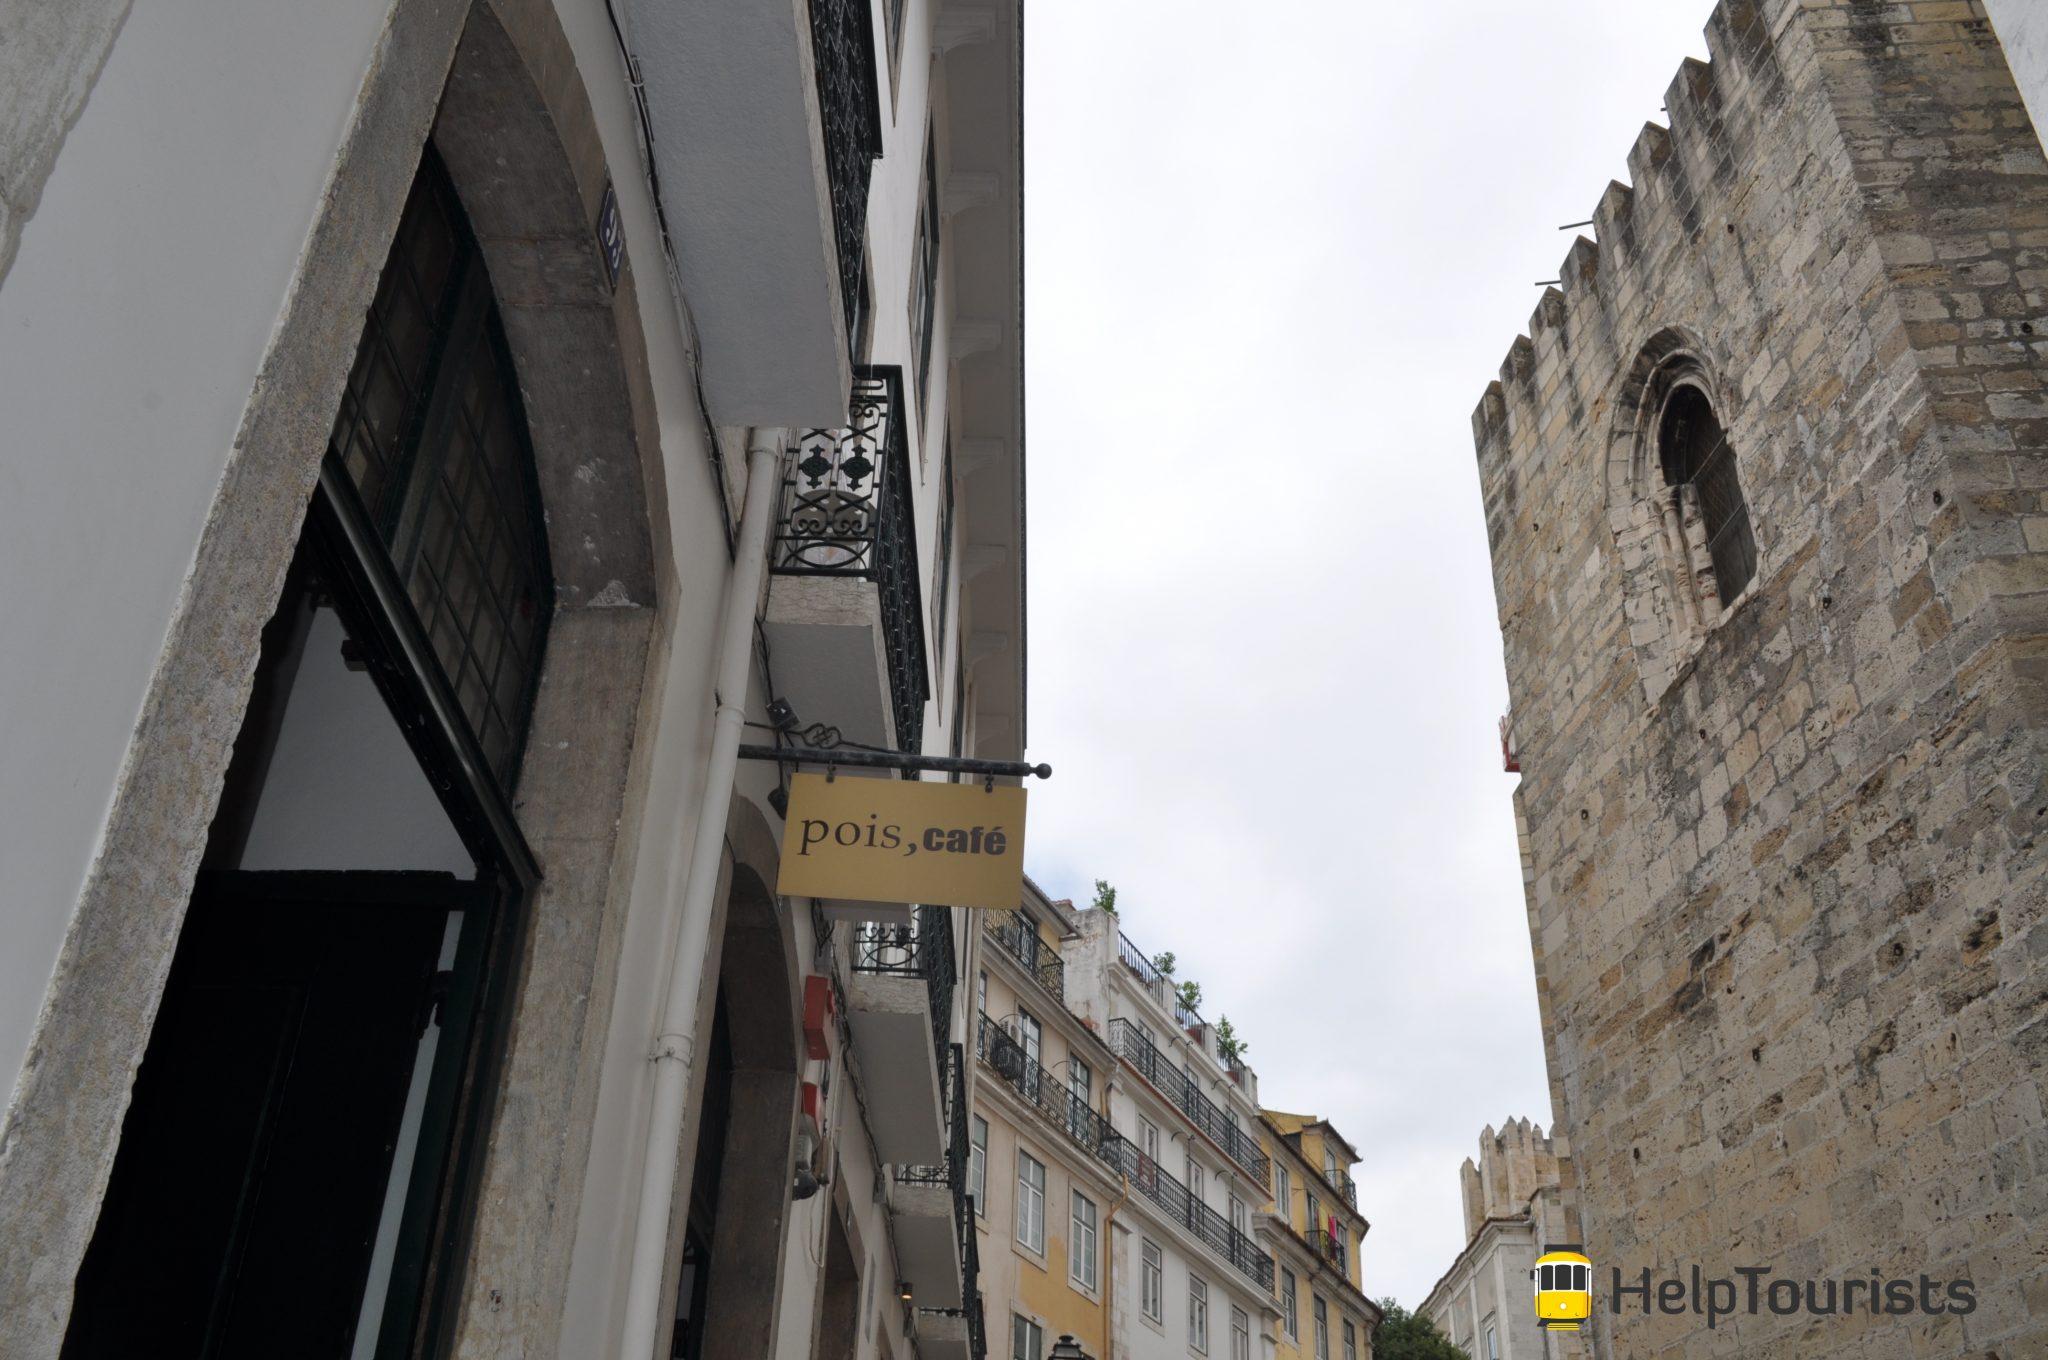 Lissabon Viertel café pois